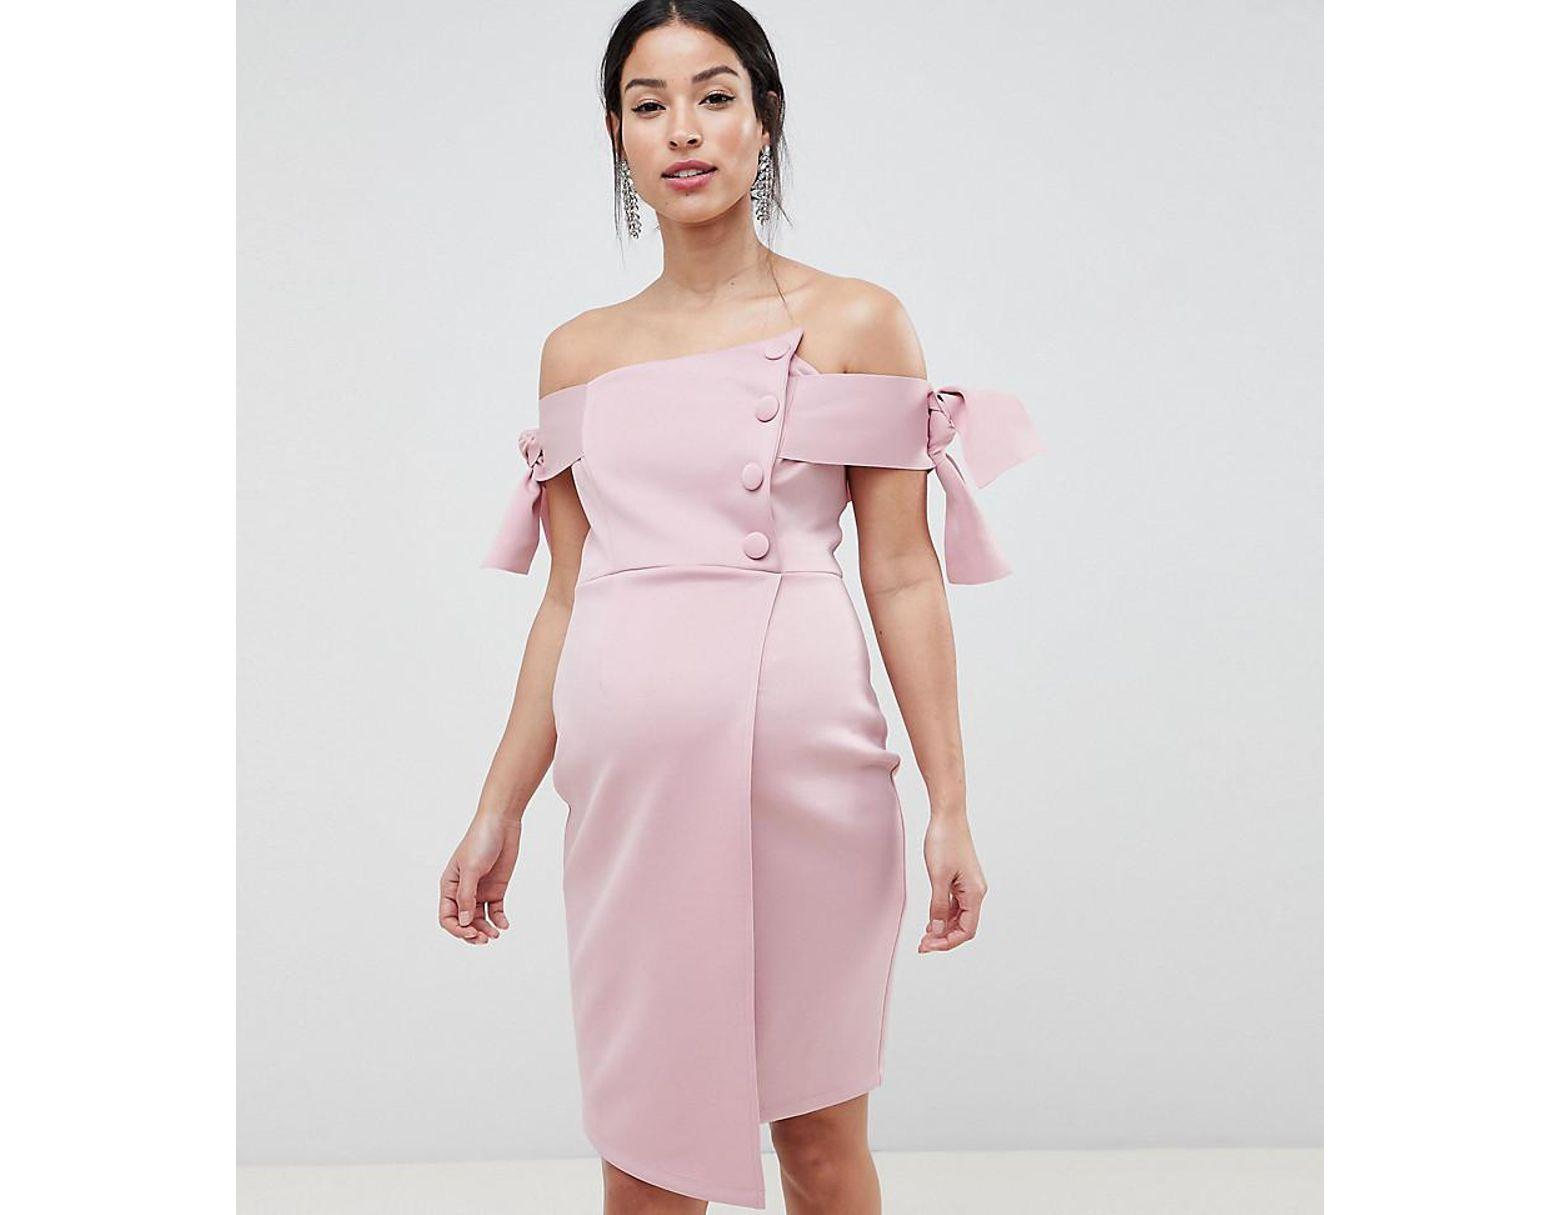 e24d8ccd3161 ASOS Asos Design Maternity Bardot Tie Sleeve Button Wrap Mini Dress in  Natural - Lyst